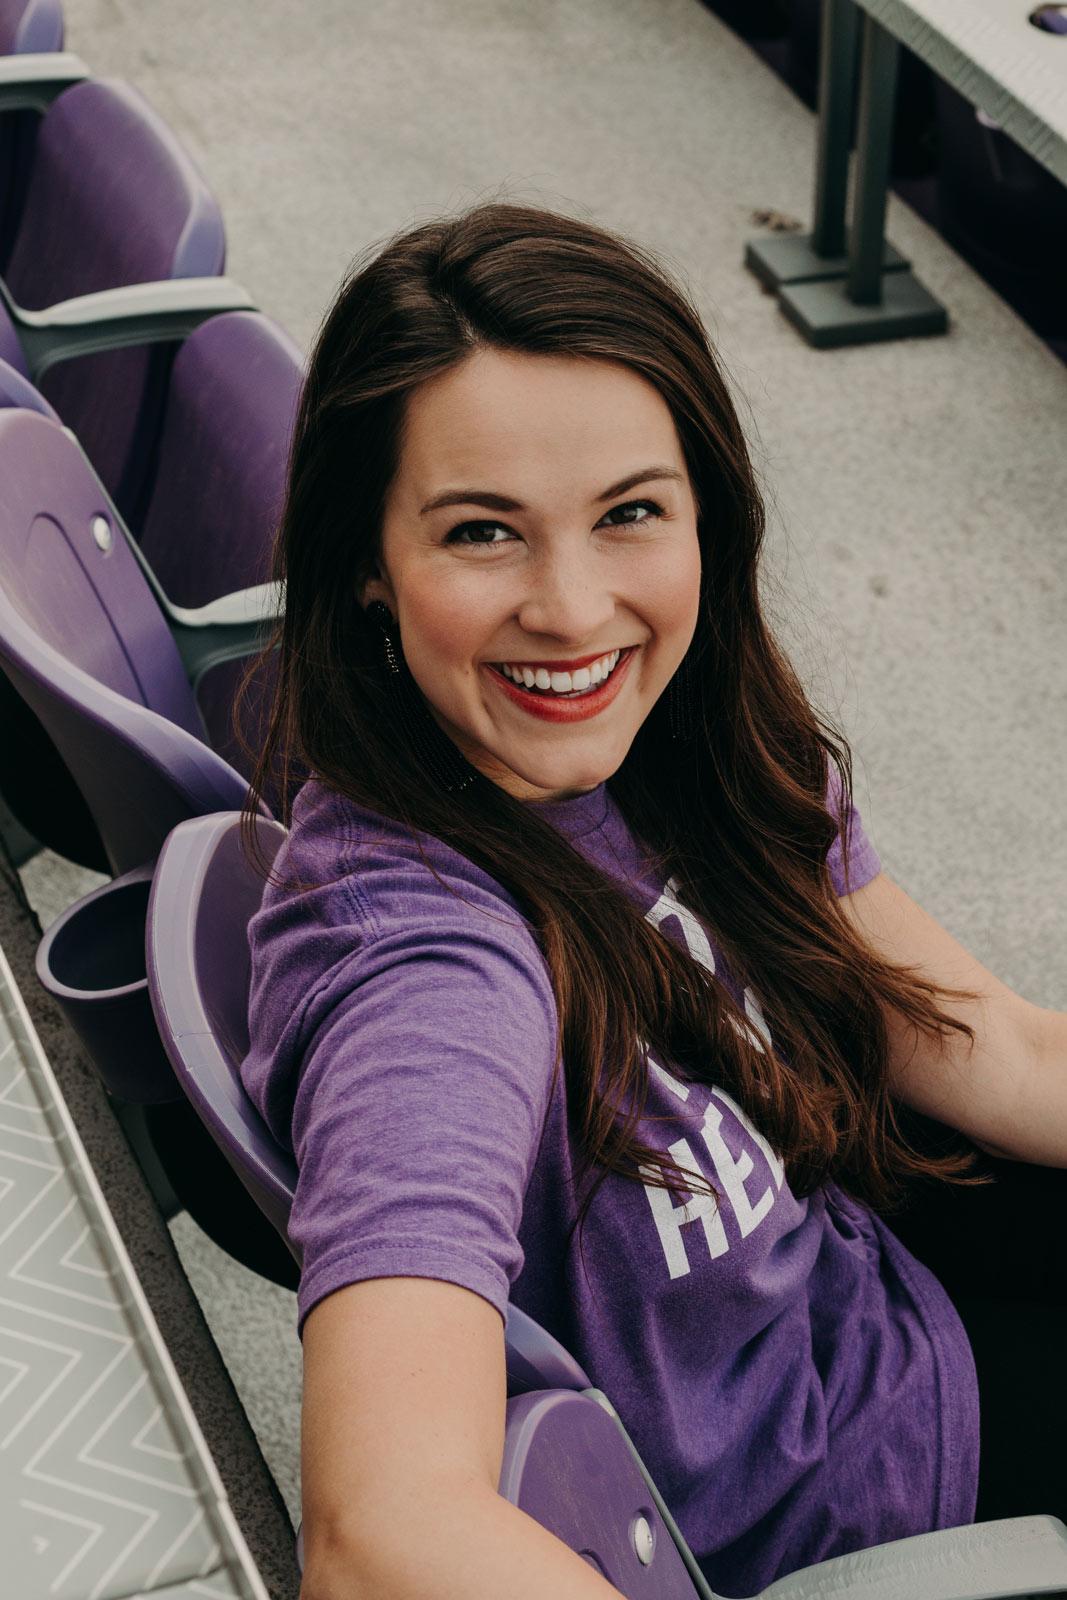 tcu photographer captures girl in stadium